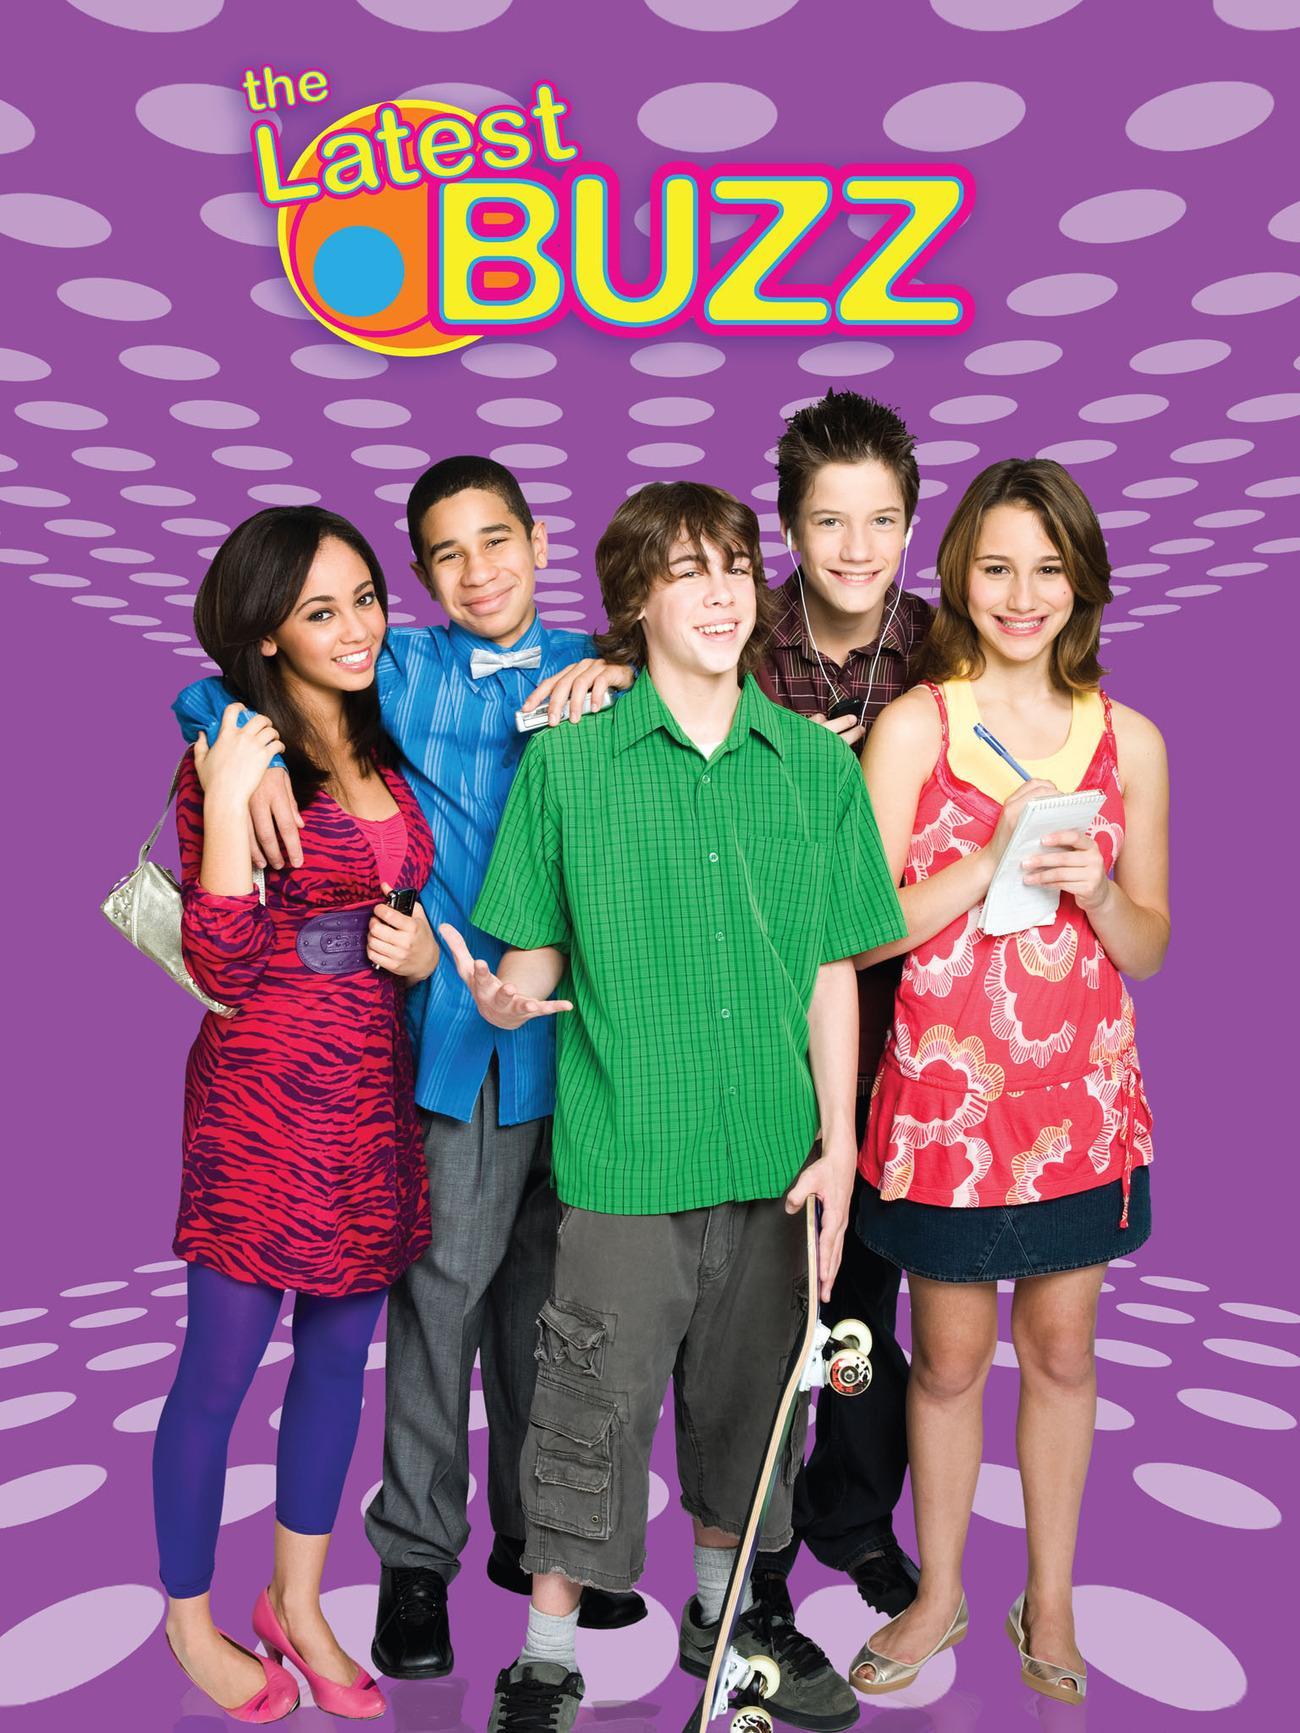 The Latest Buzz: Season 1